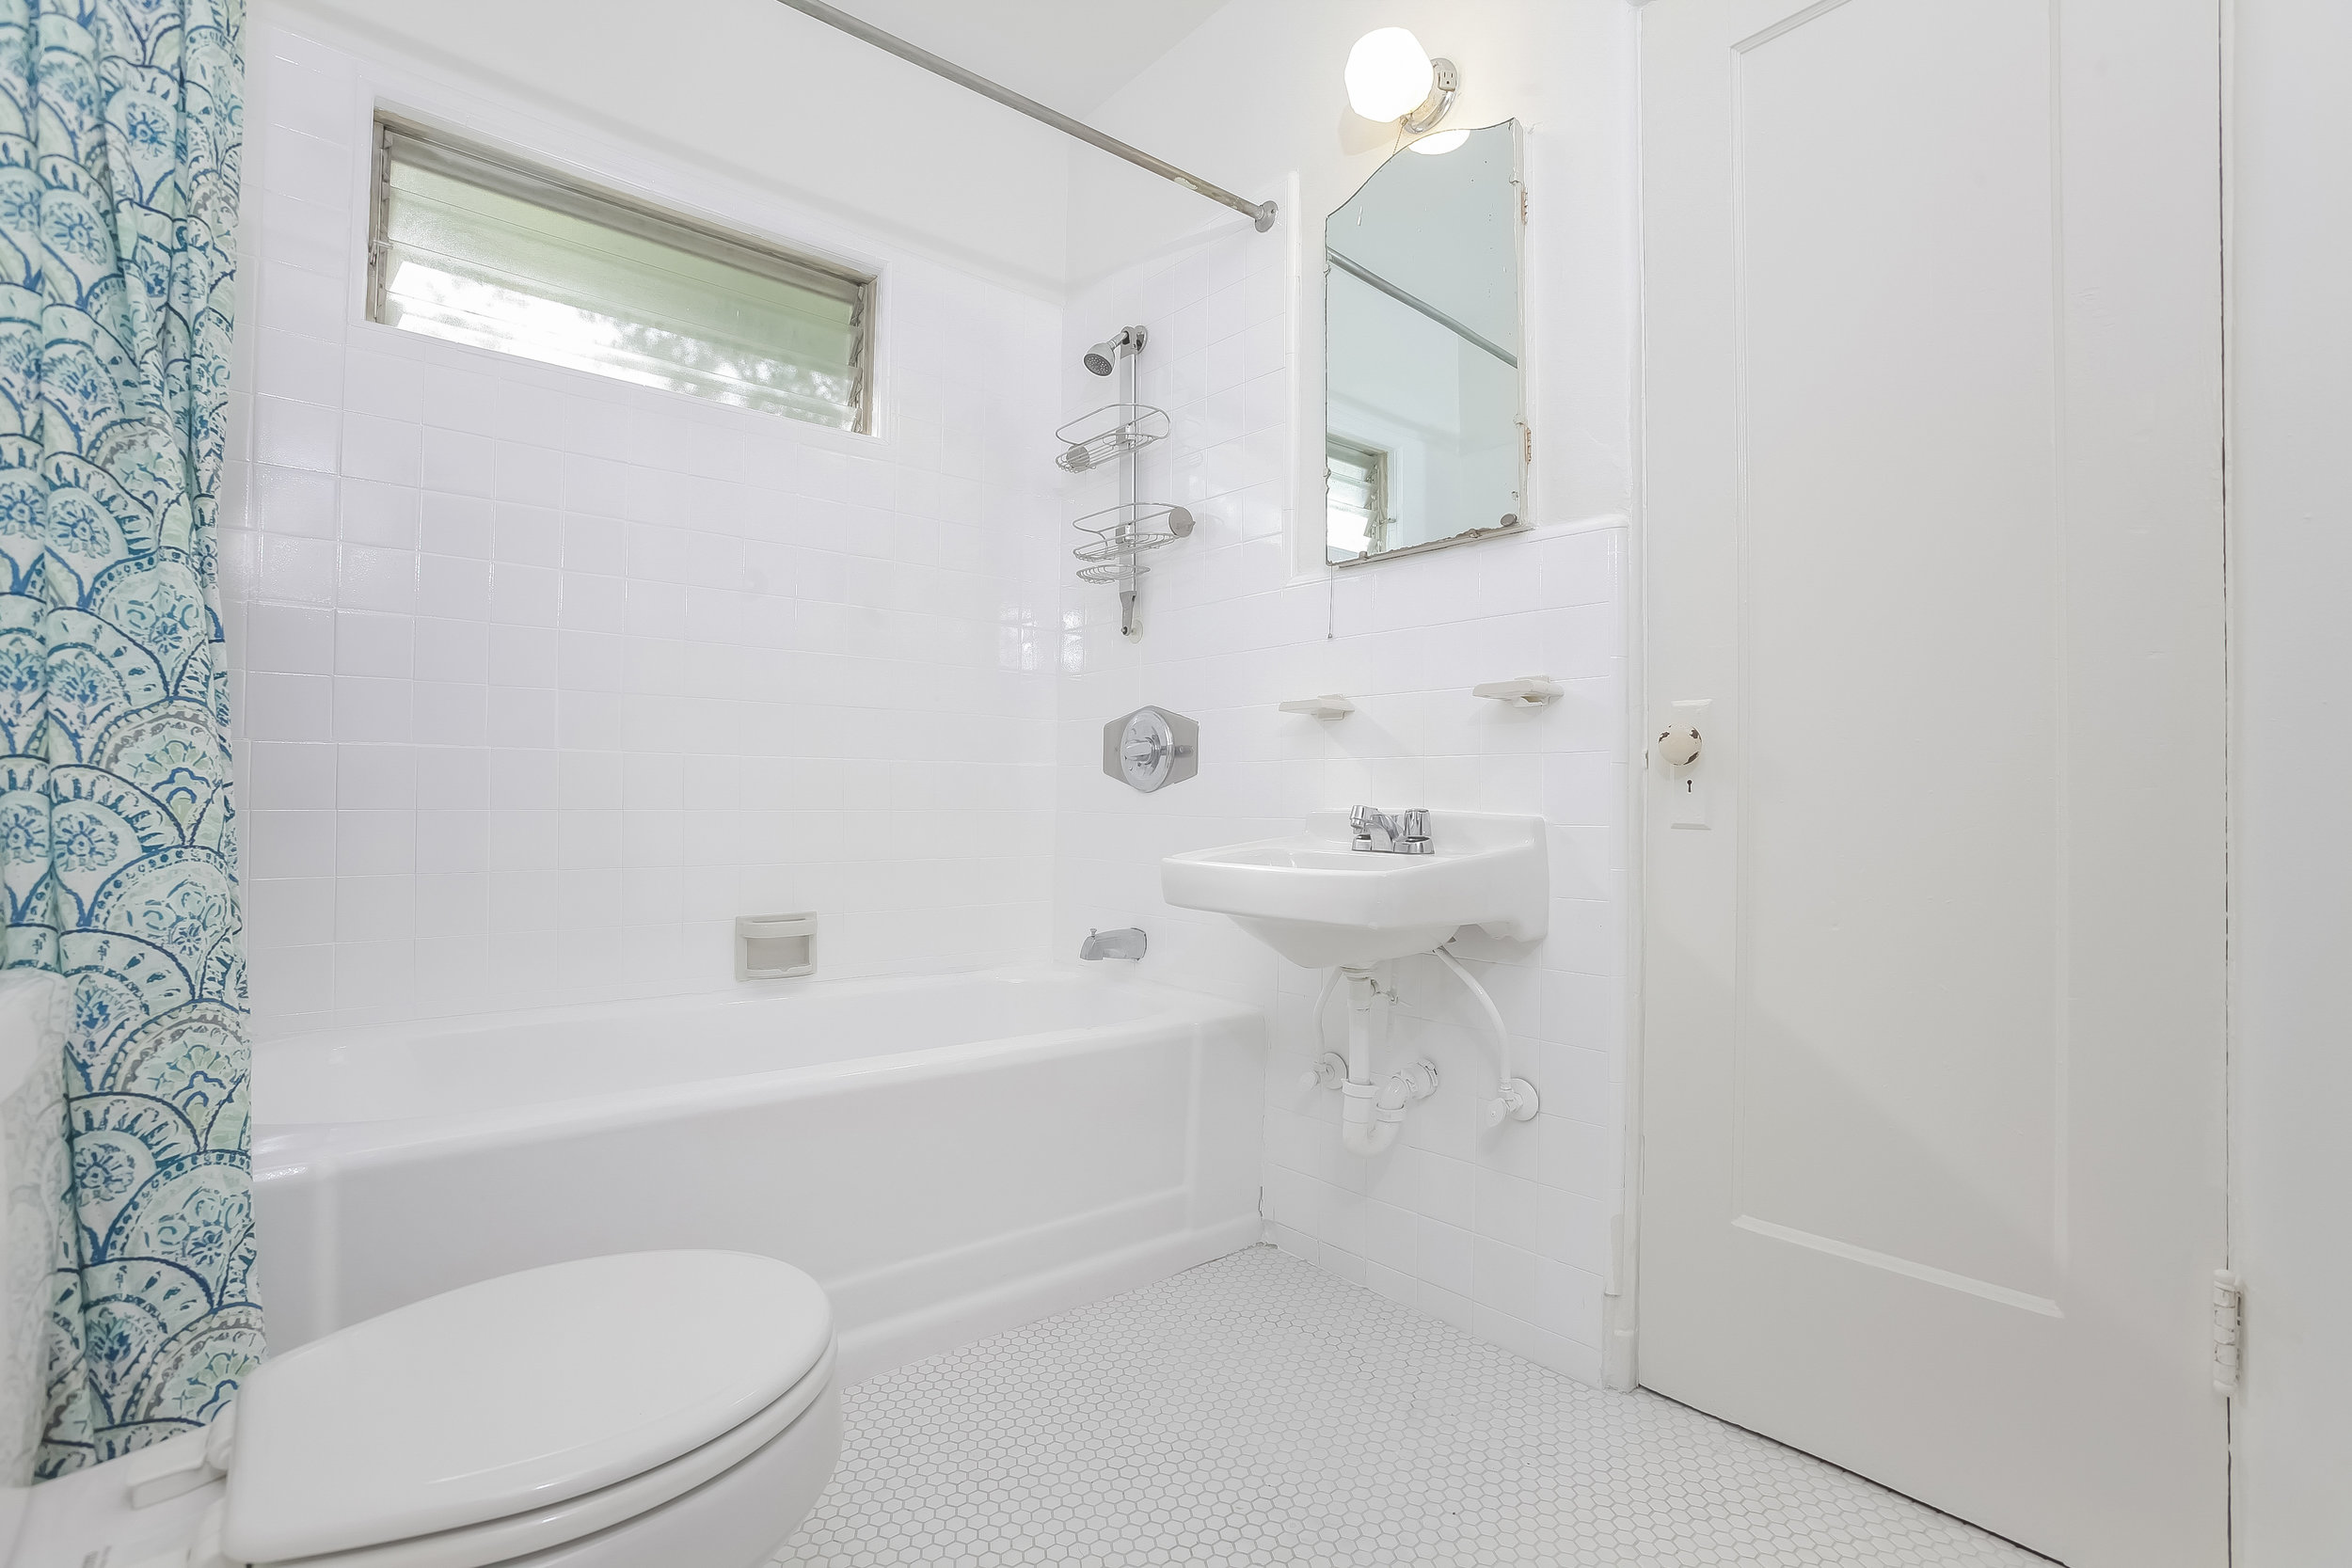 017-Bathroom-4517253-large.jpg